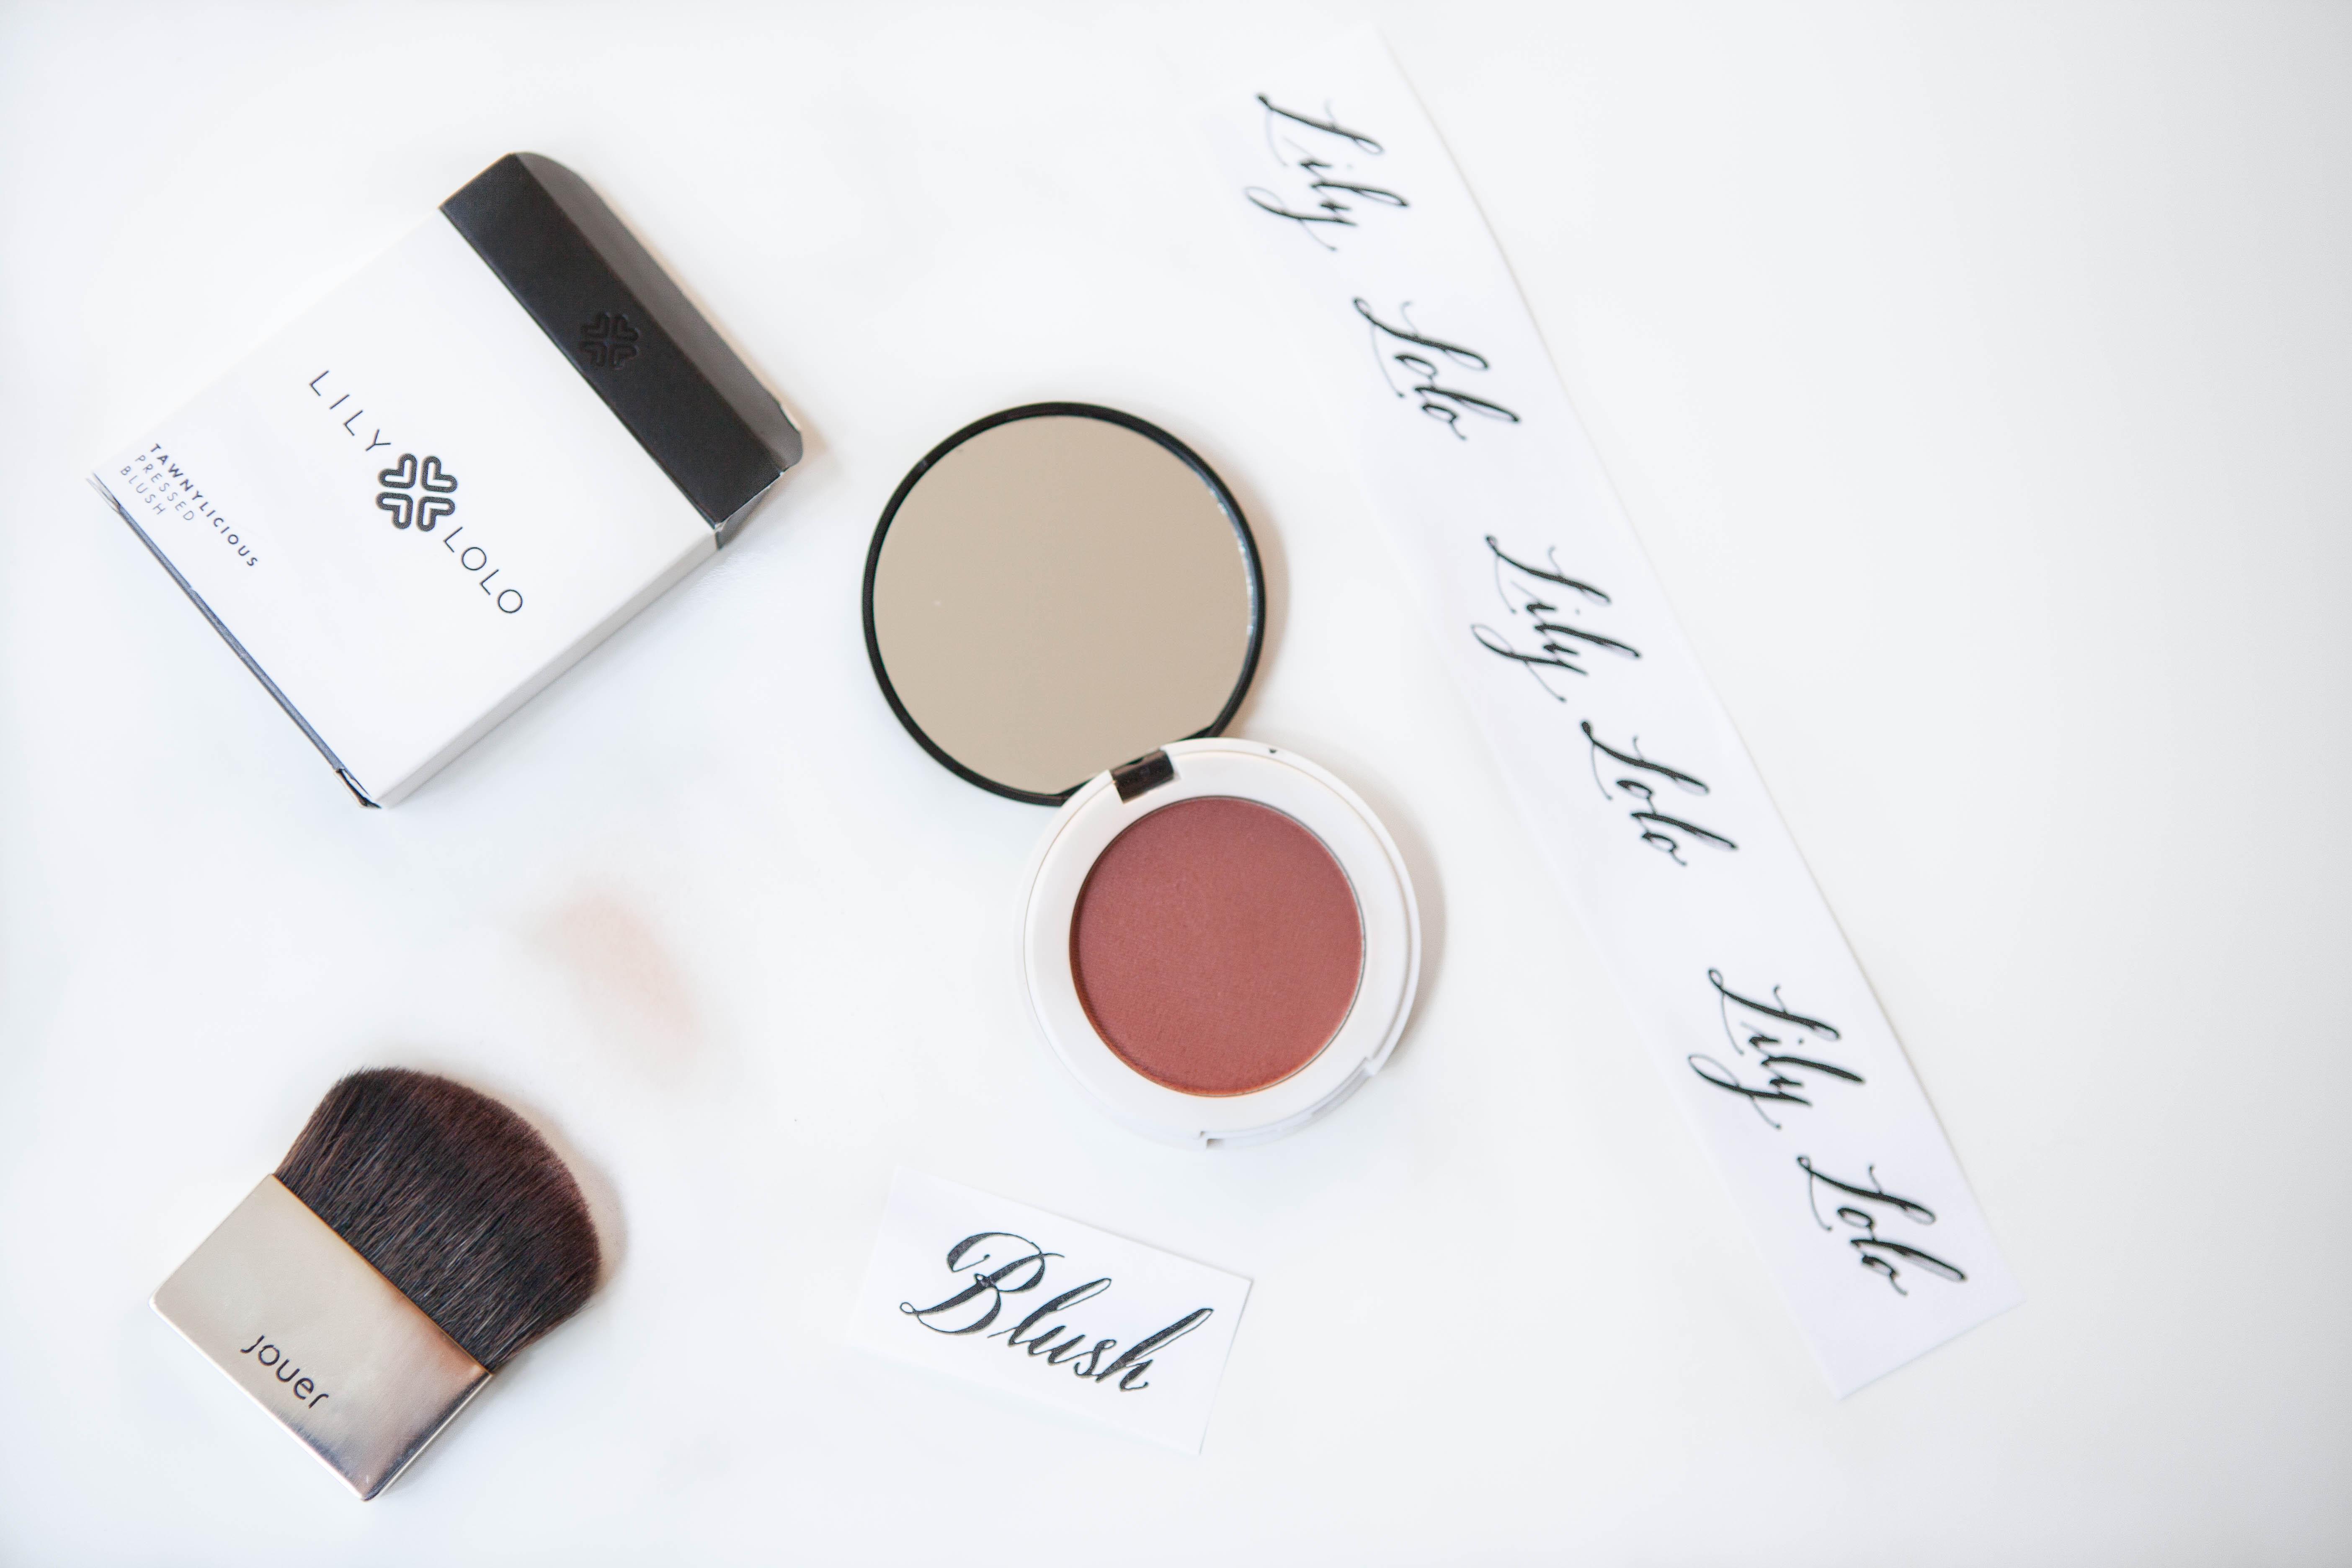 Blush Brush by Lily Lolo #21